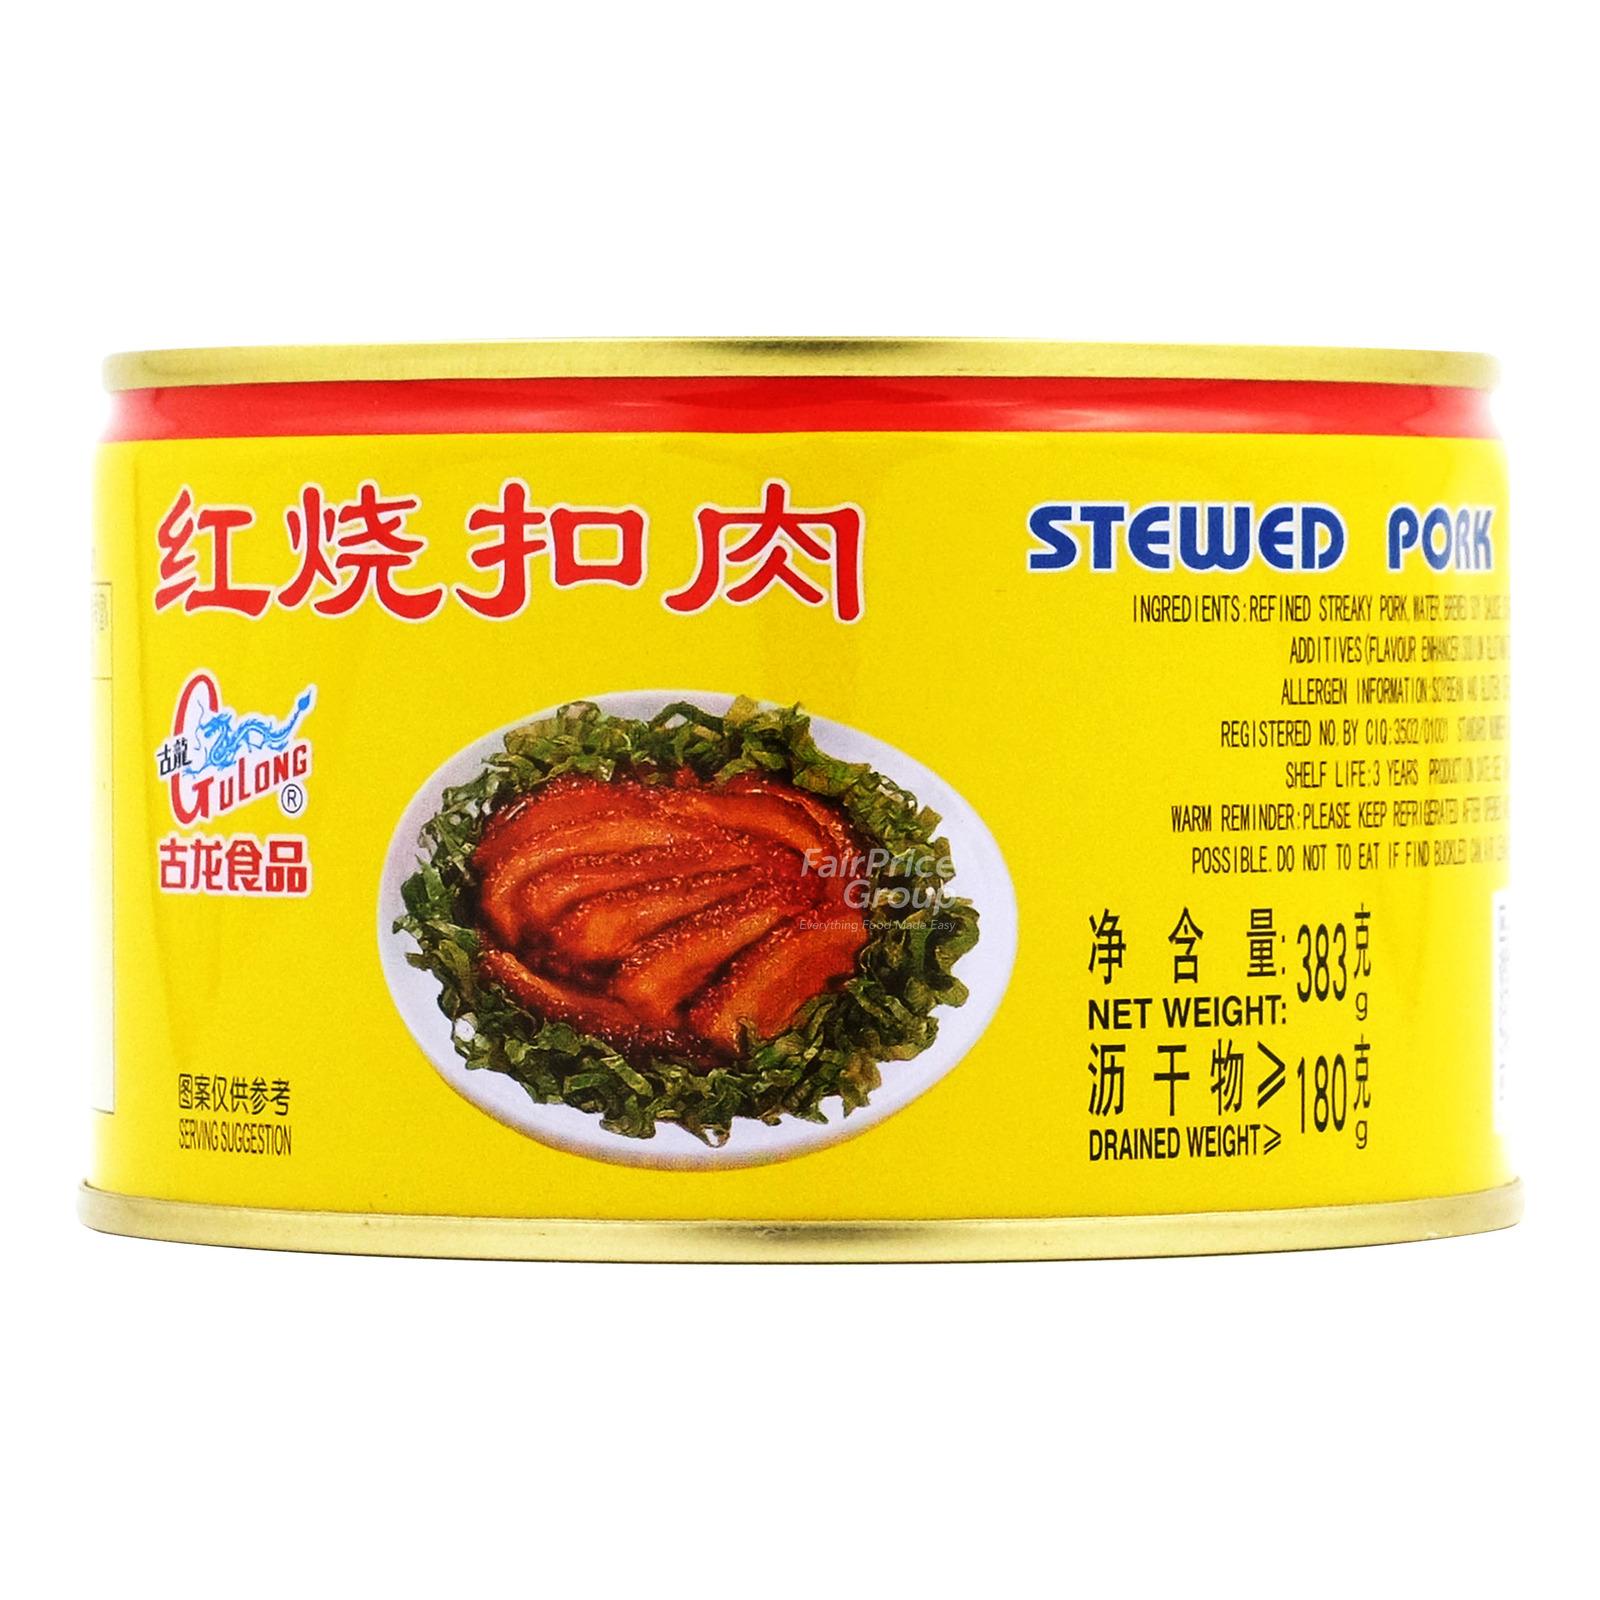 Gulong Stewed Pork Sliced 383G